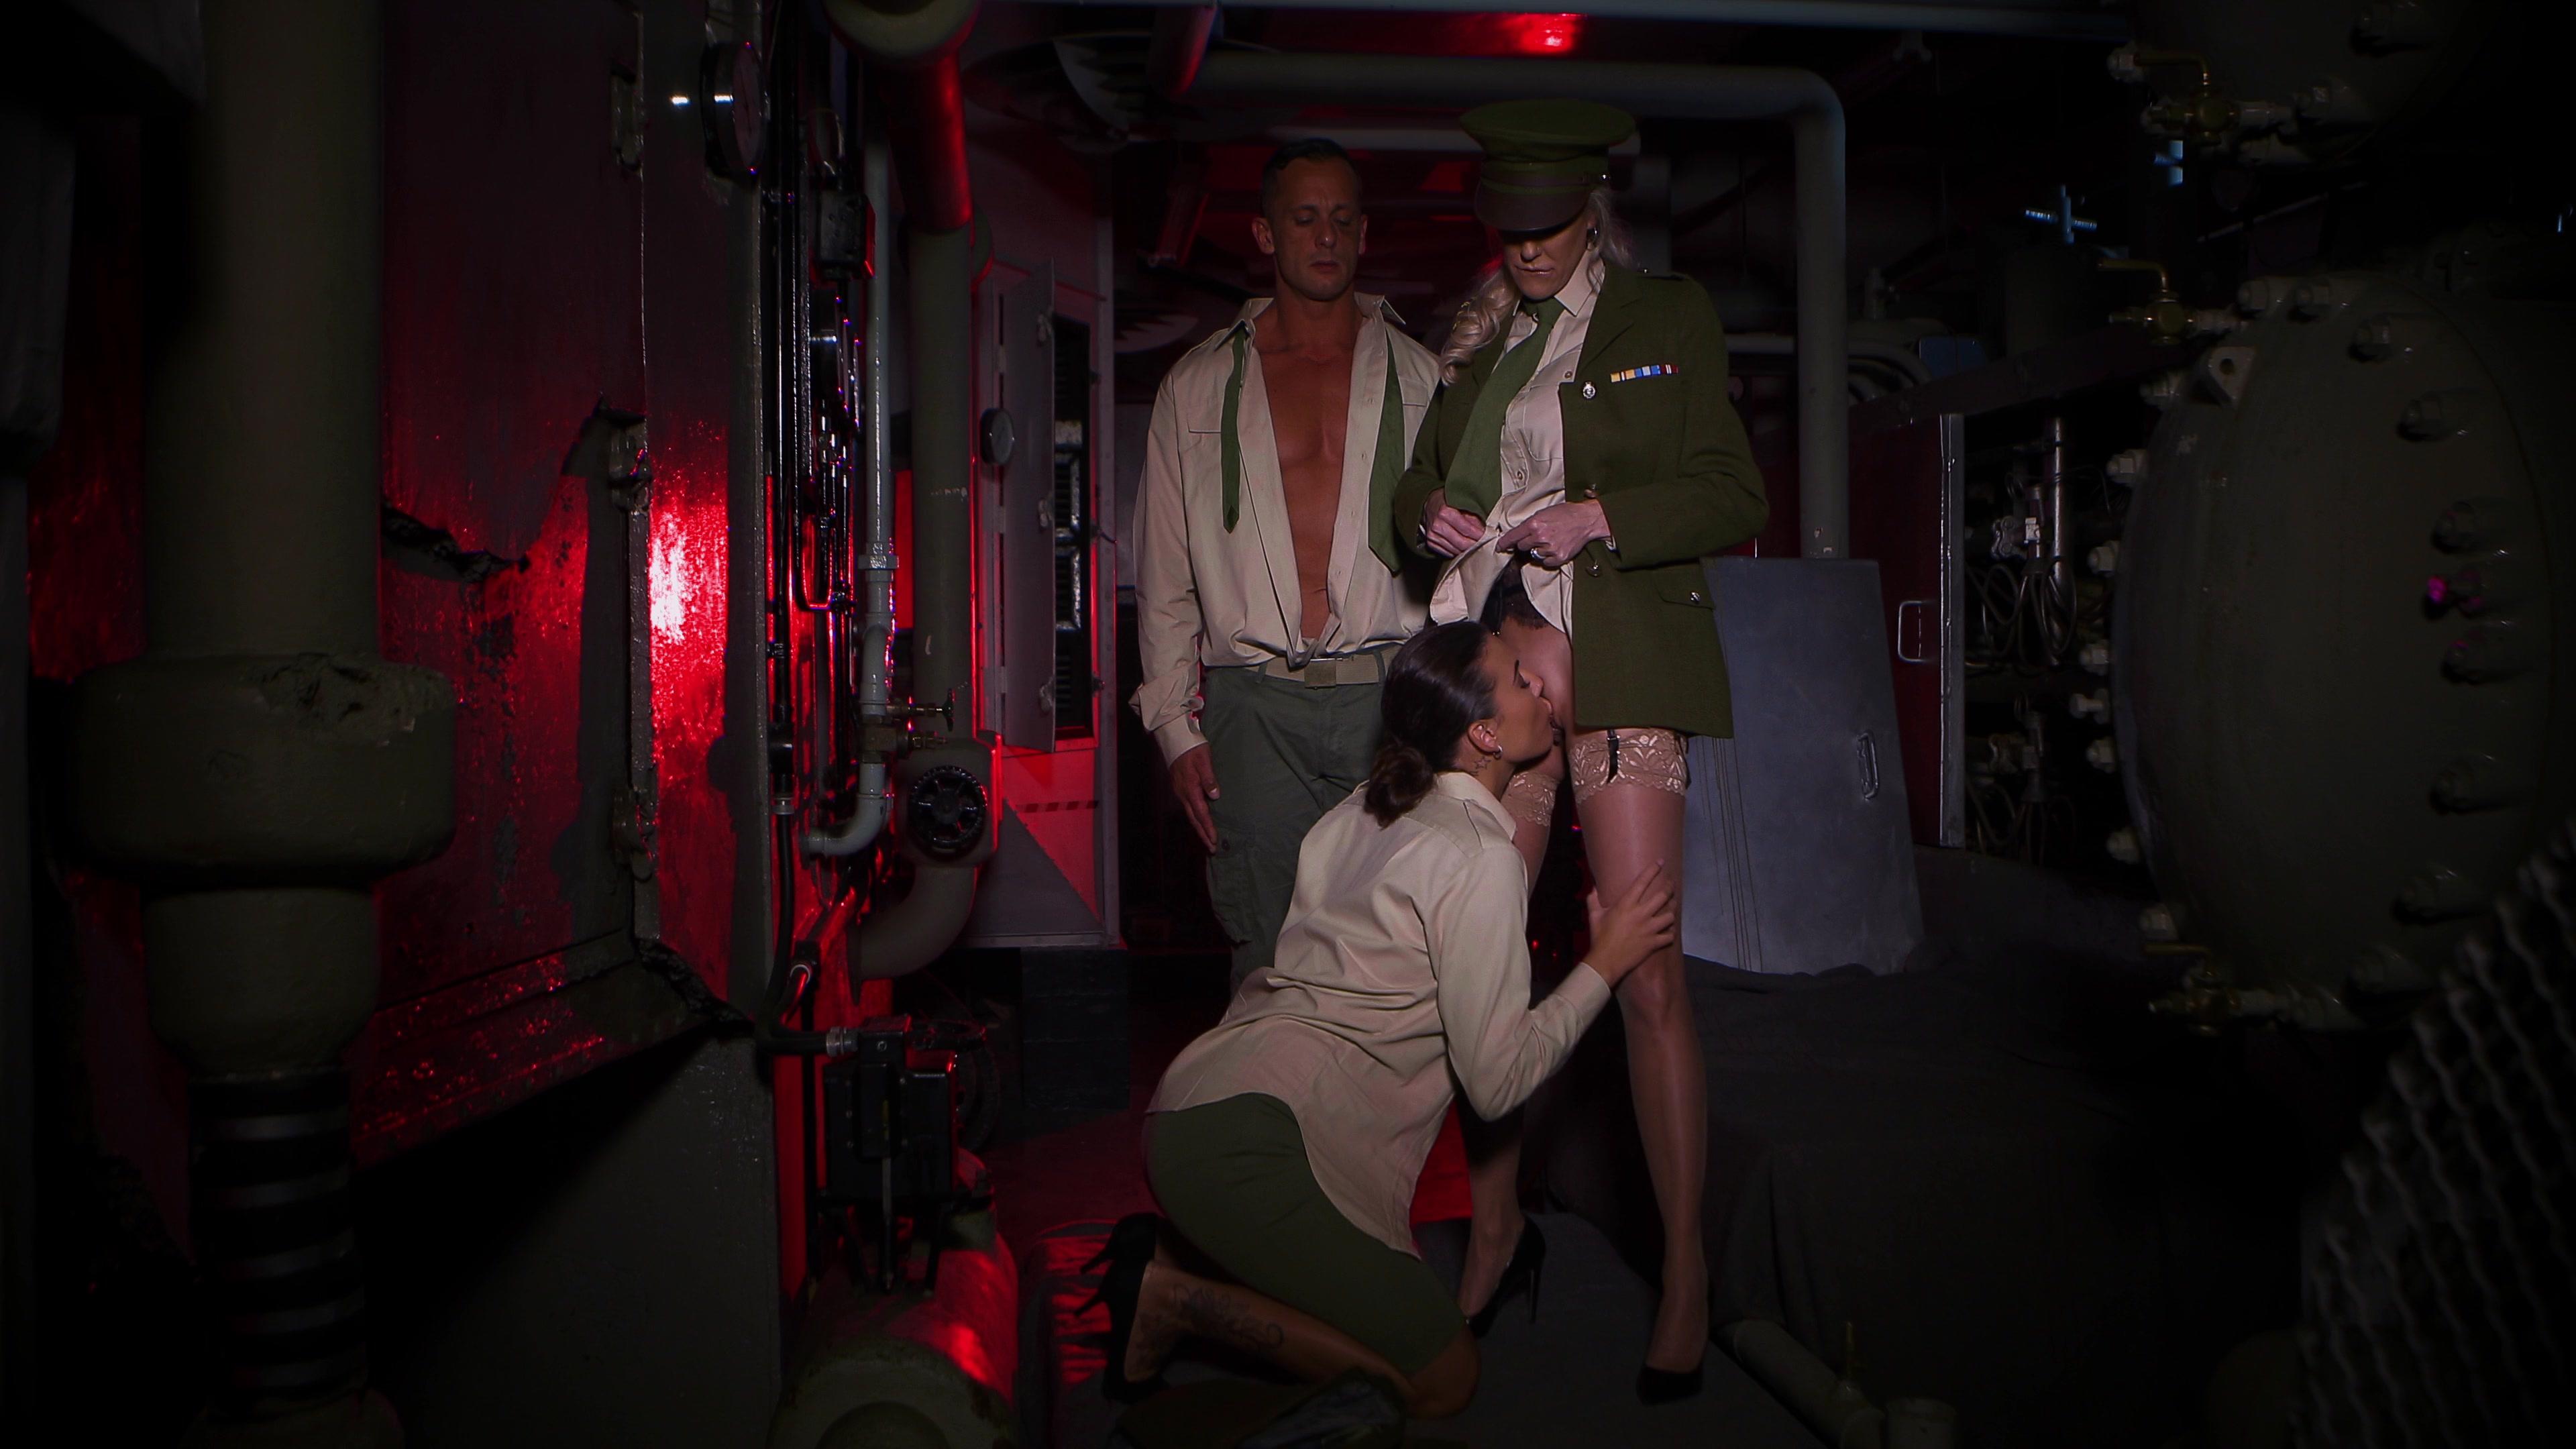 Une Beurette Se Masturbe Avant Une Sodomie Tube Porno Beurette Et Arabe